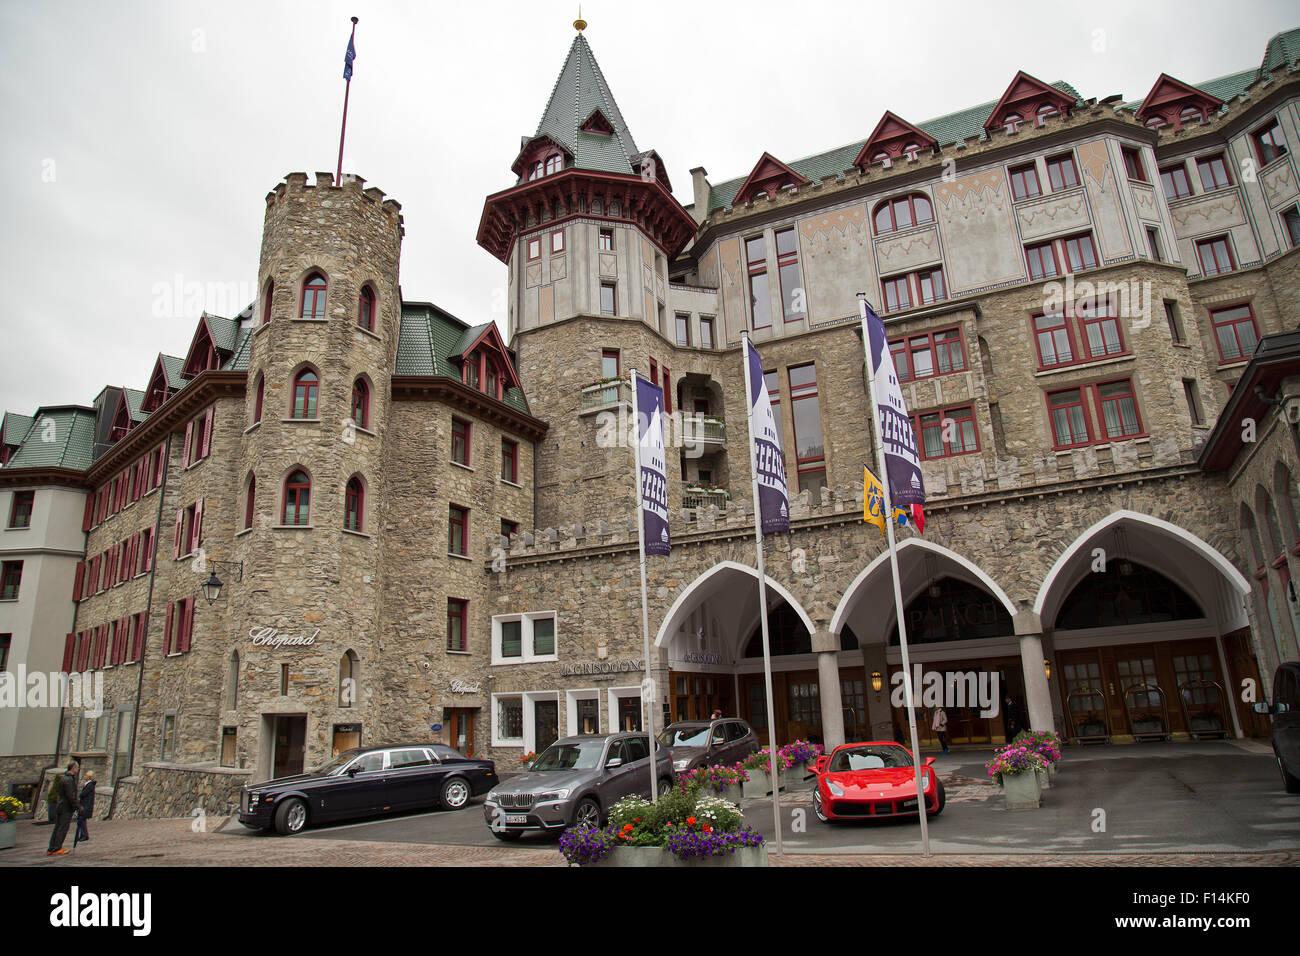 Badrutt S Palace Hotel